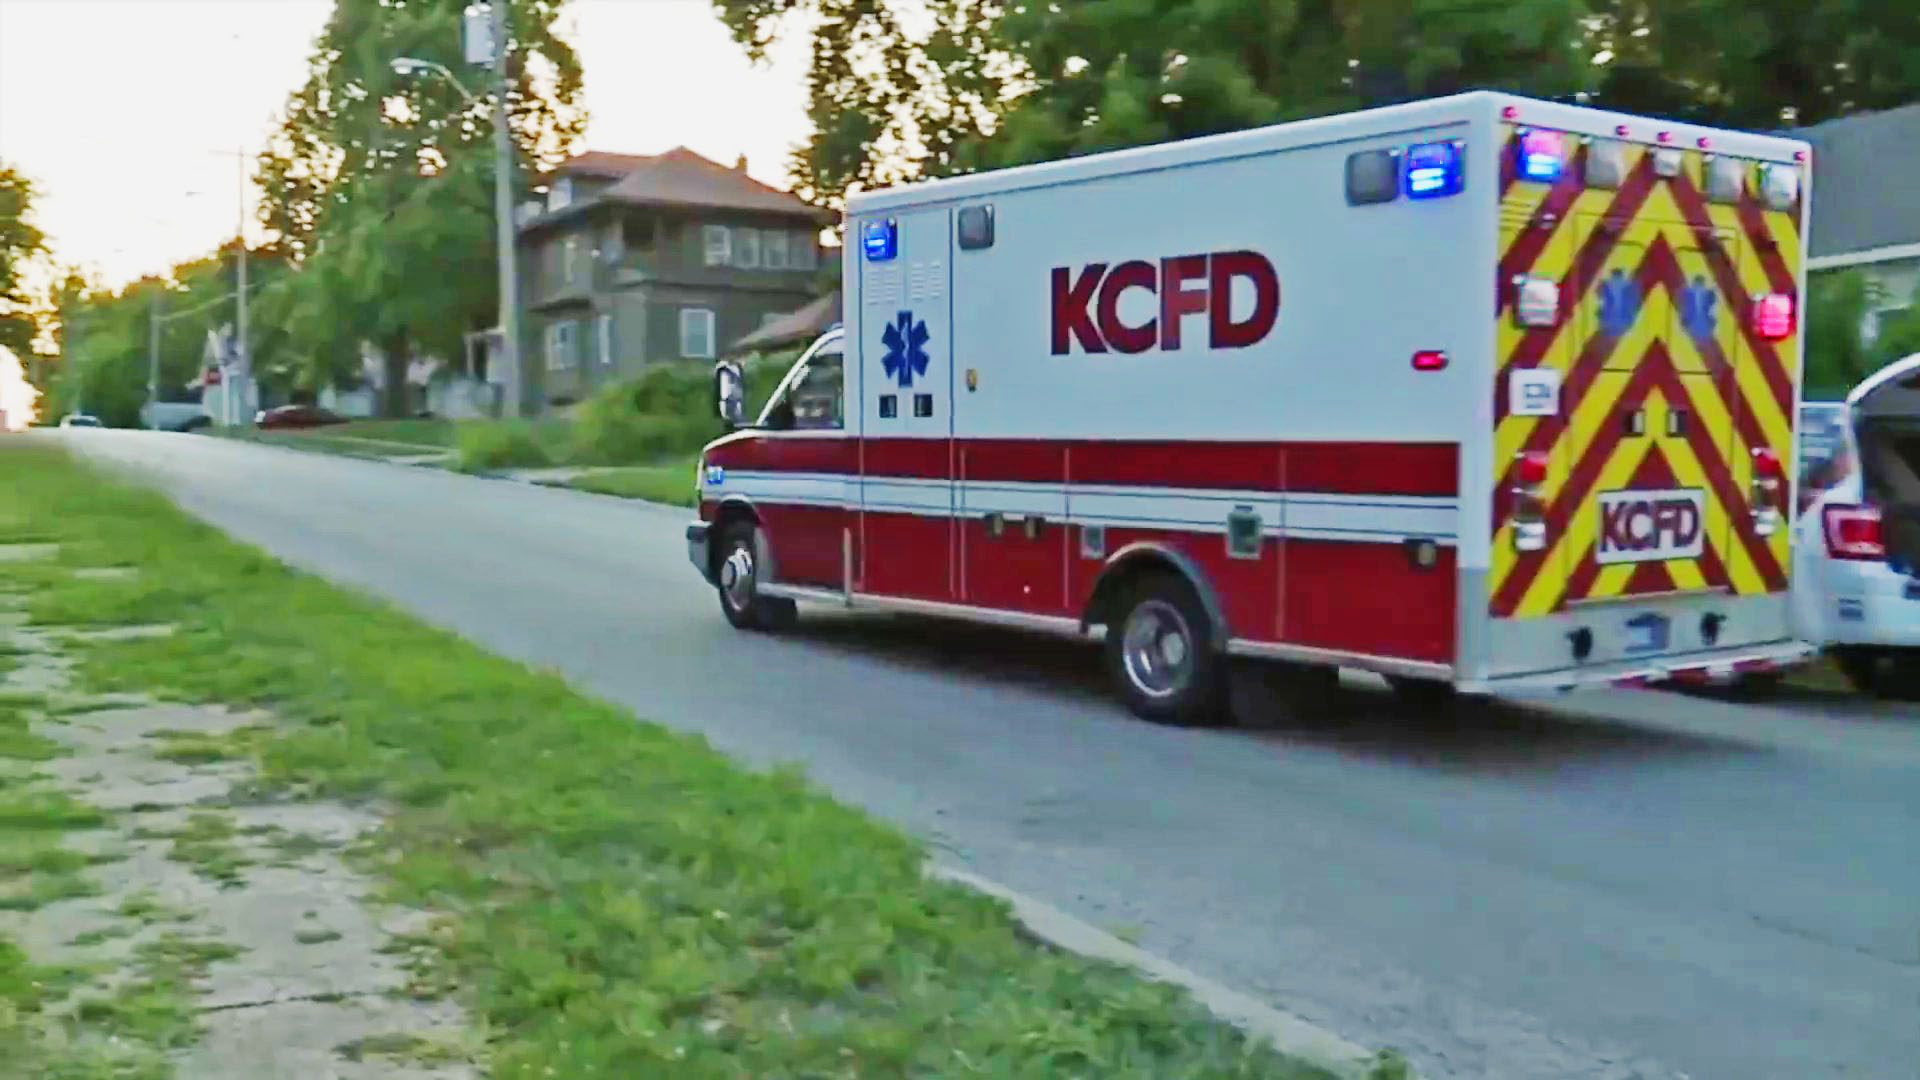 Picture of KCFD ambulance